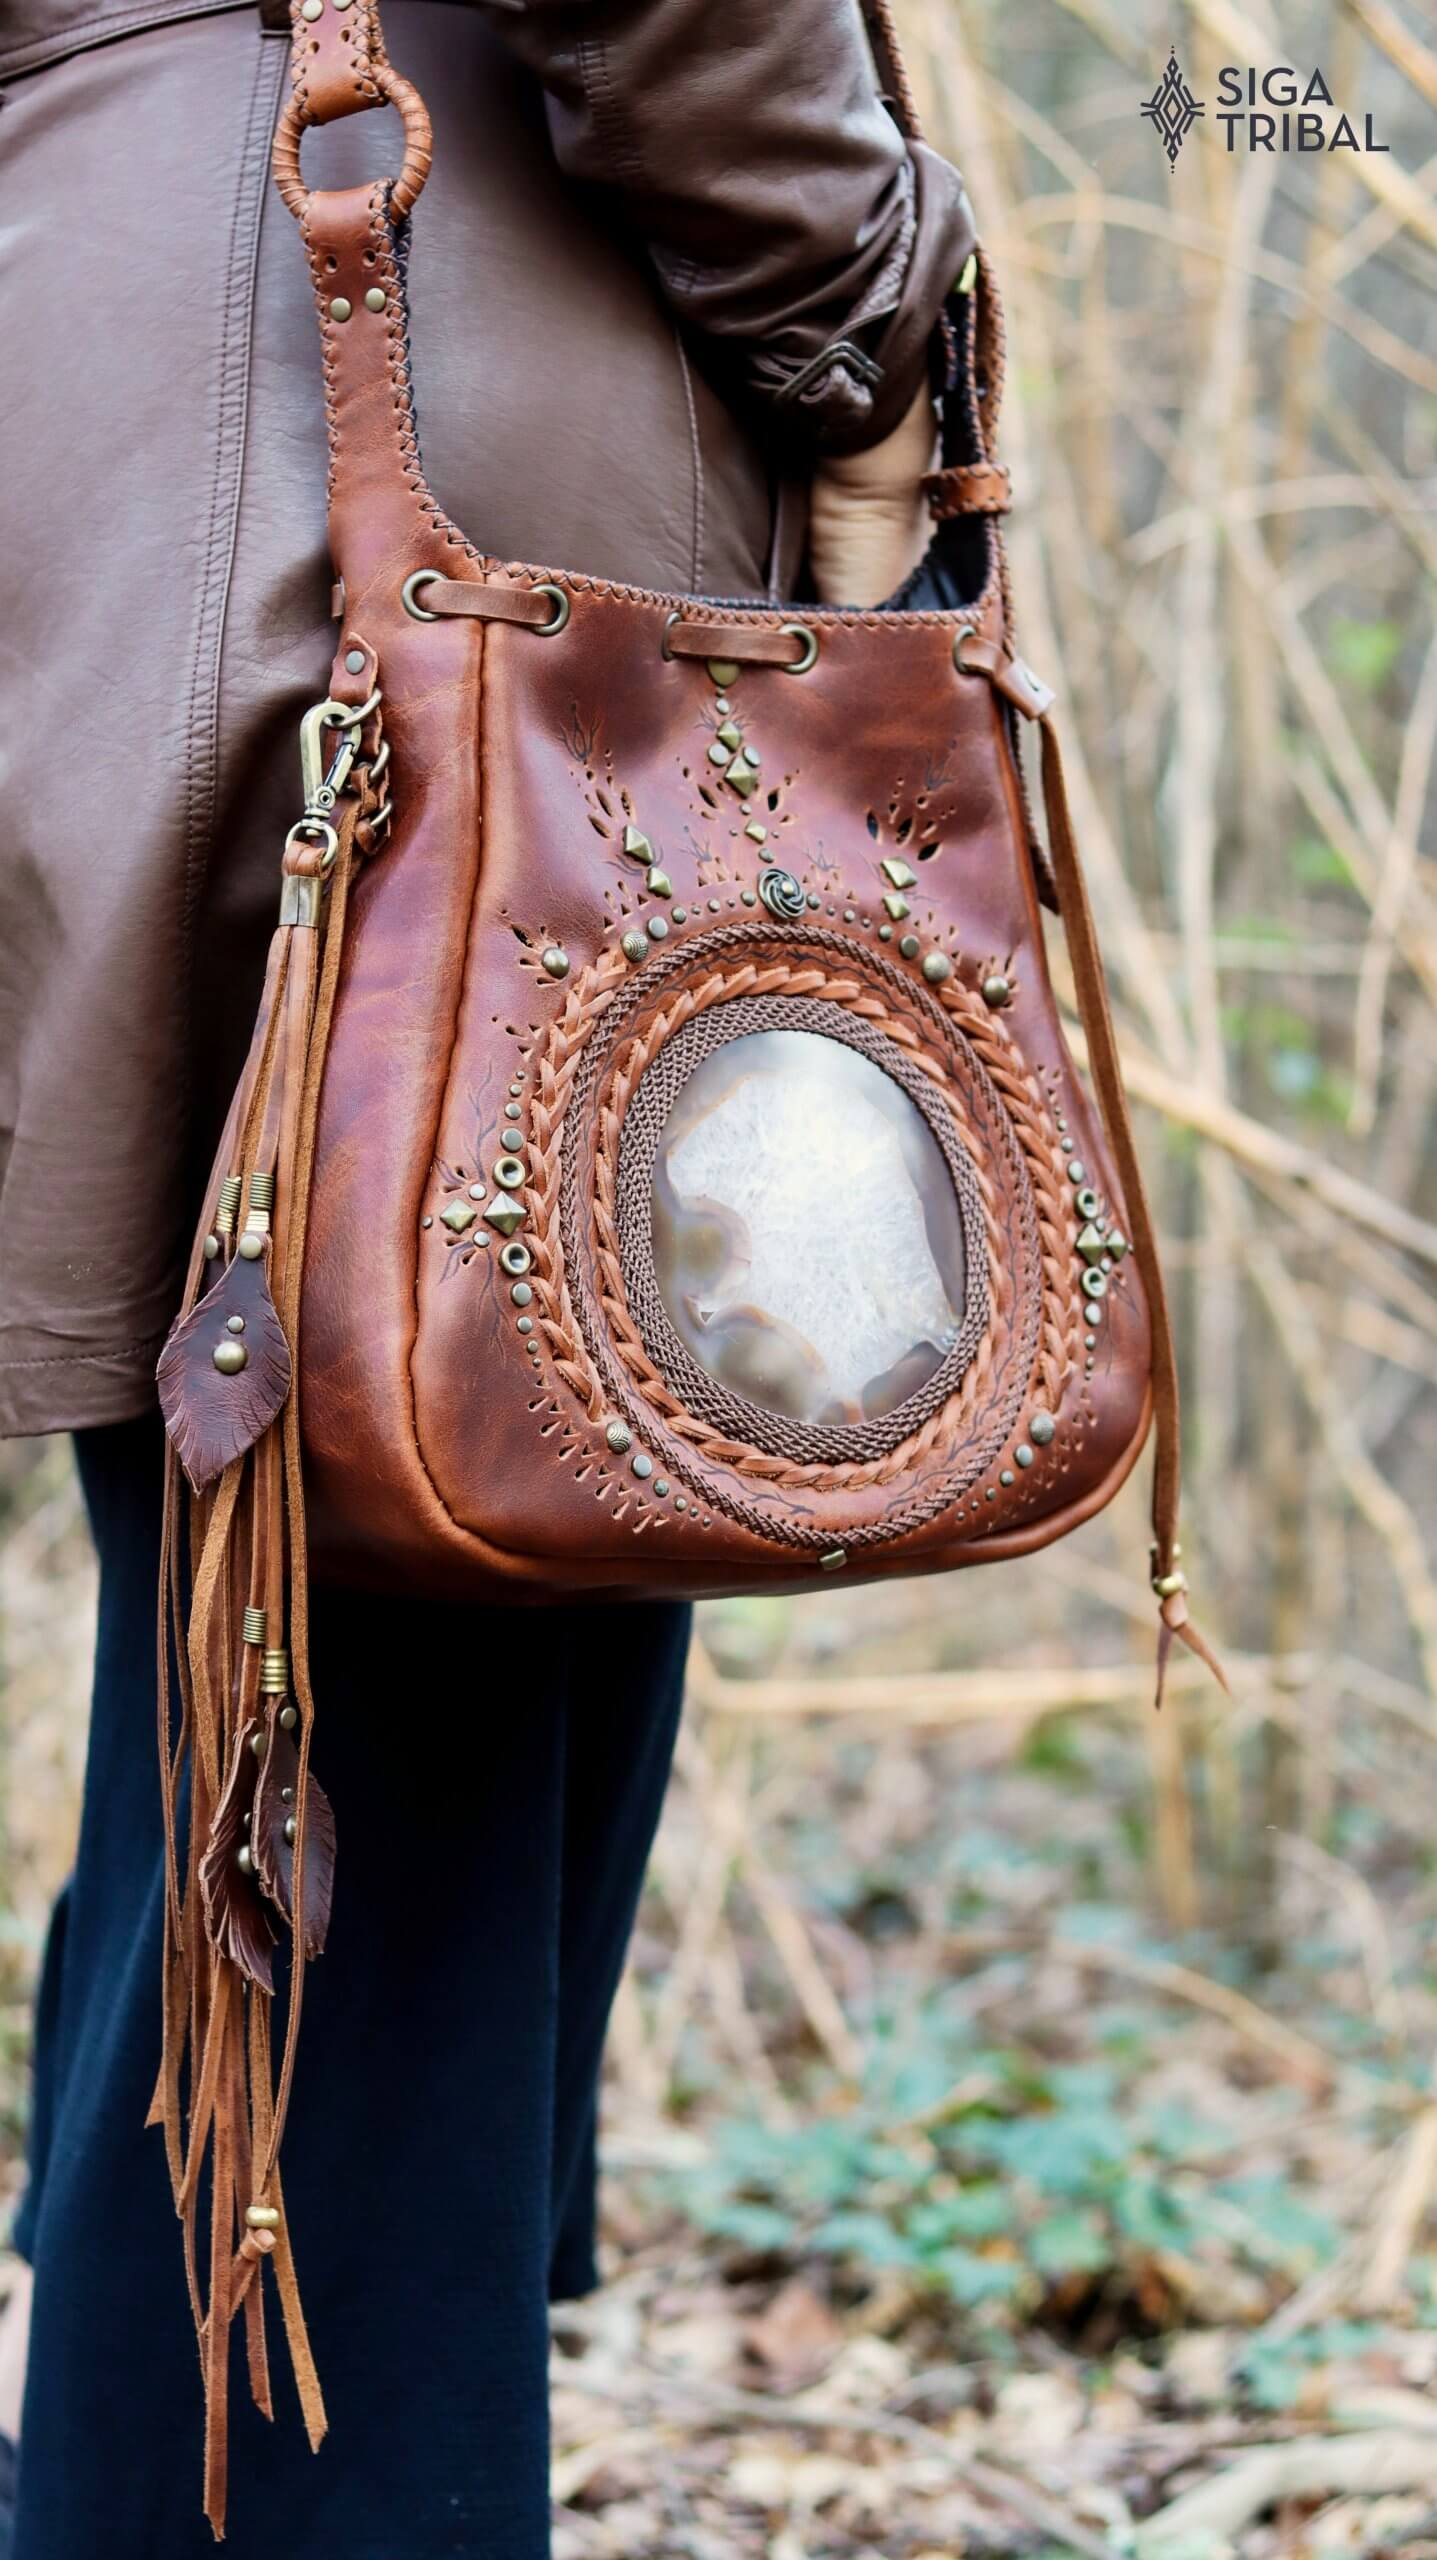 Tan Bag by Siga Tribal